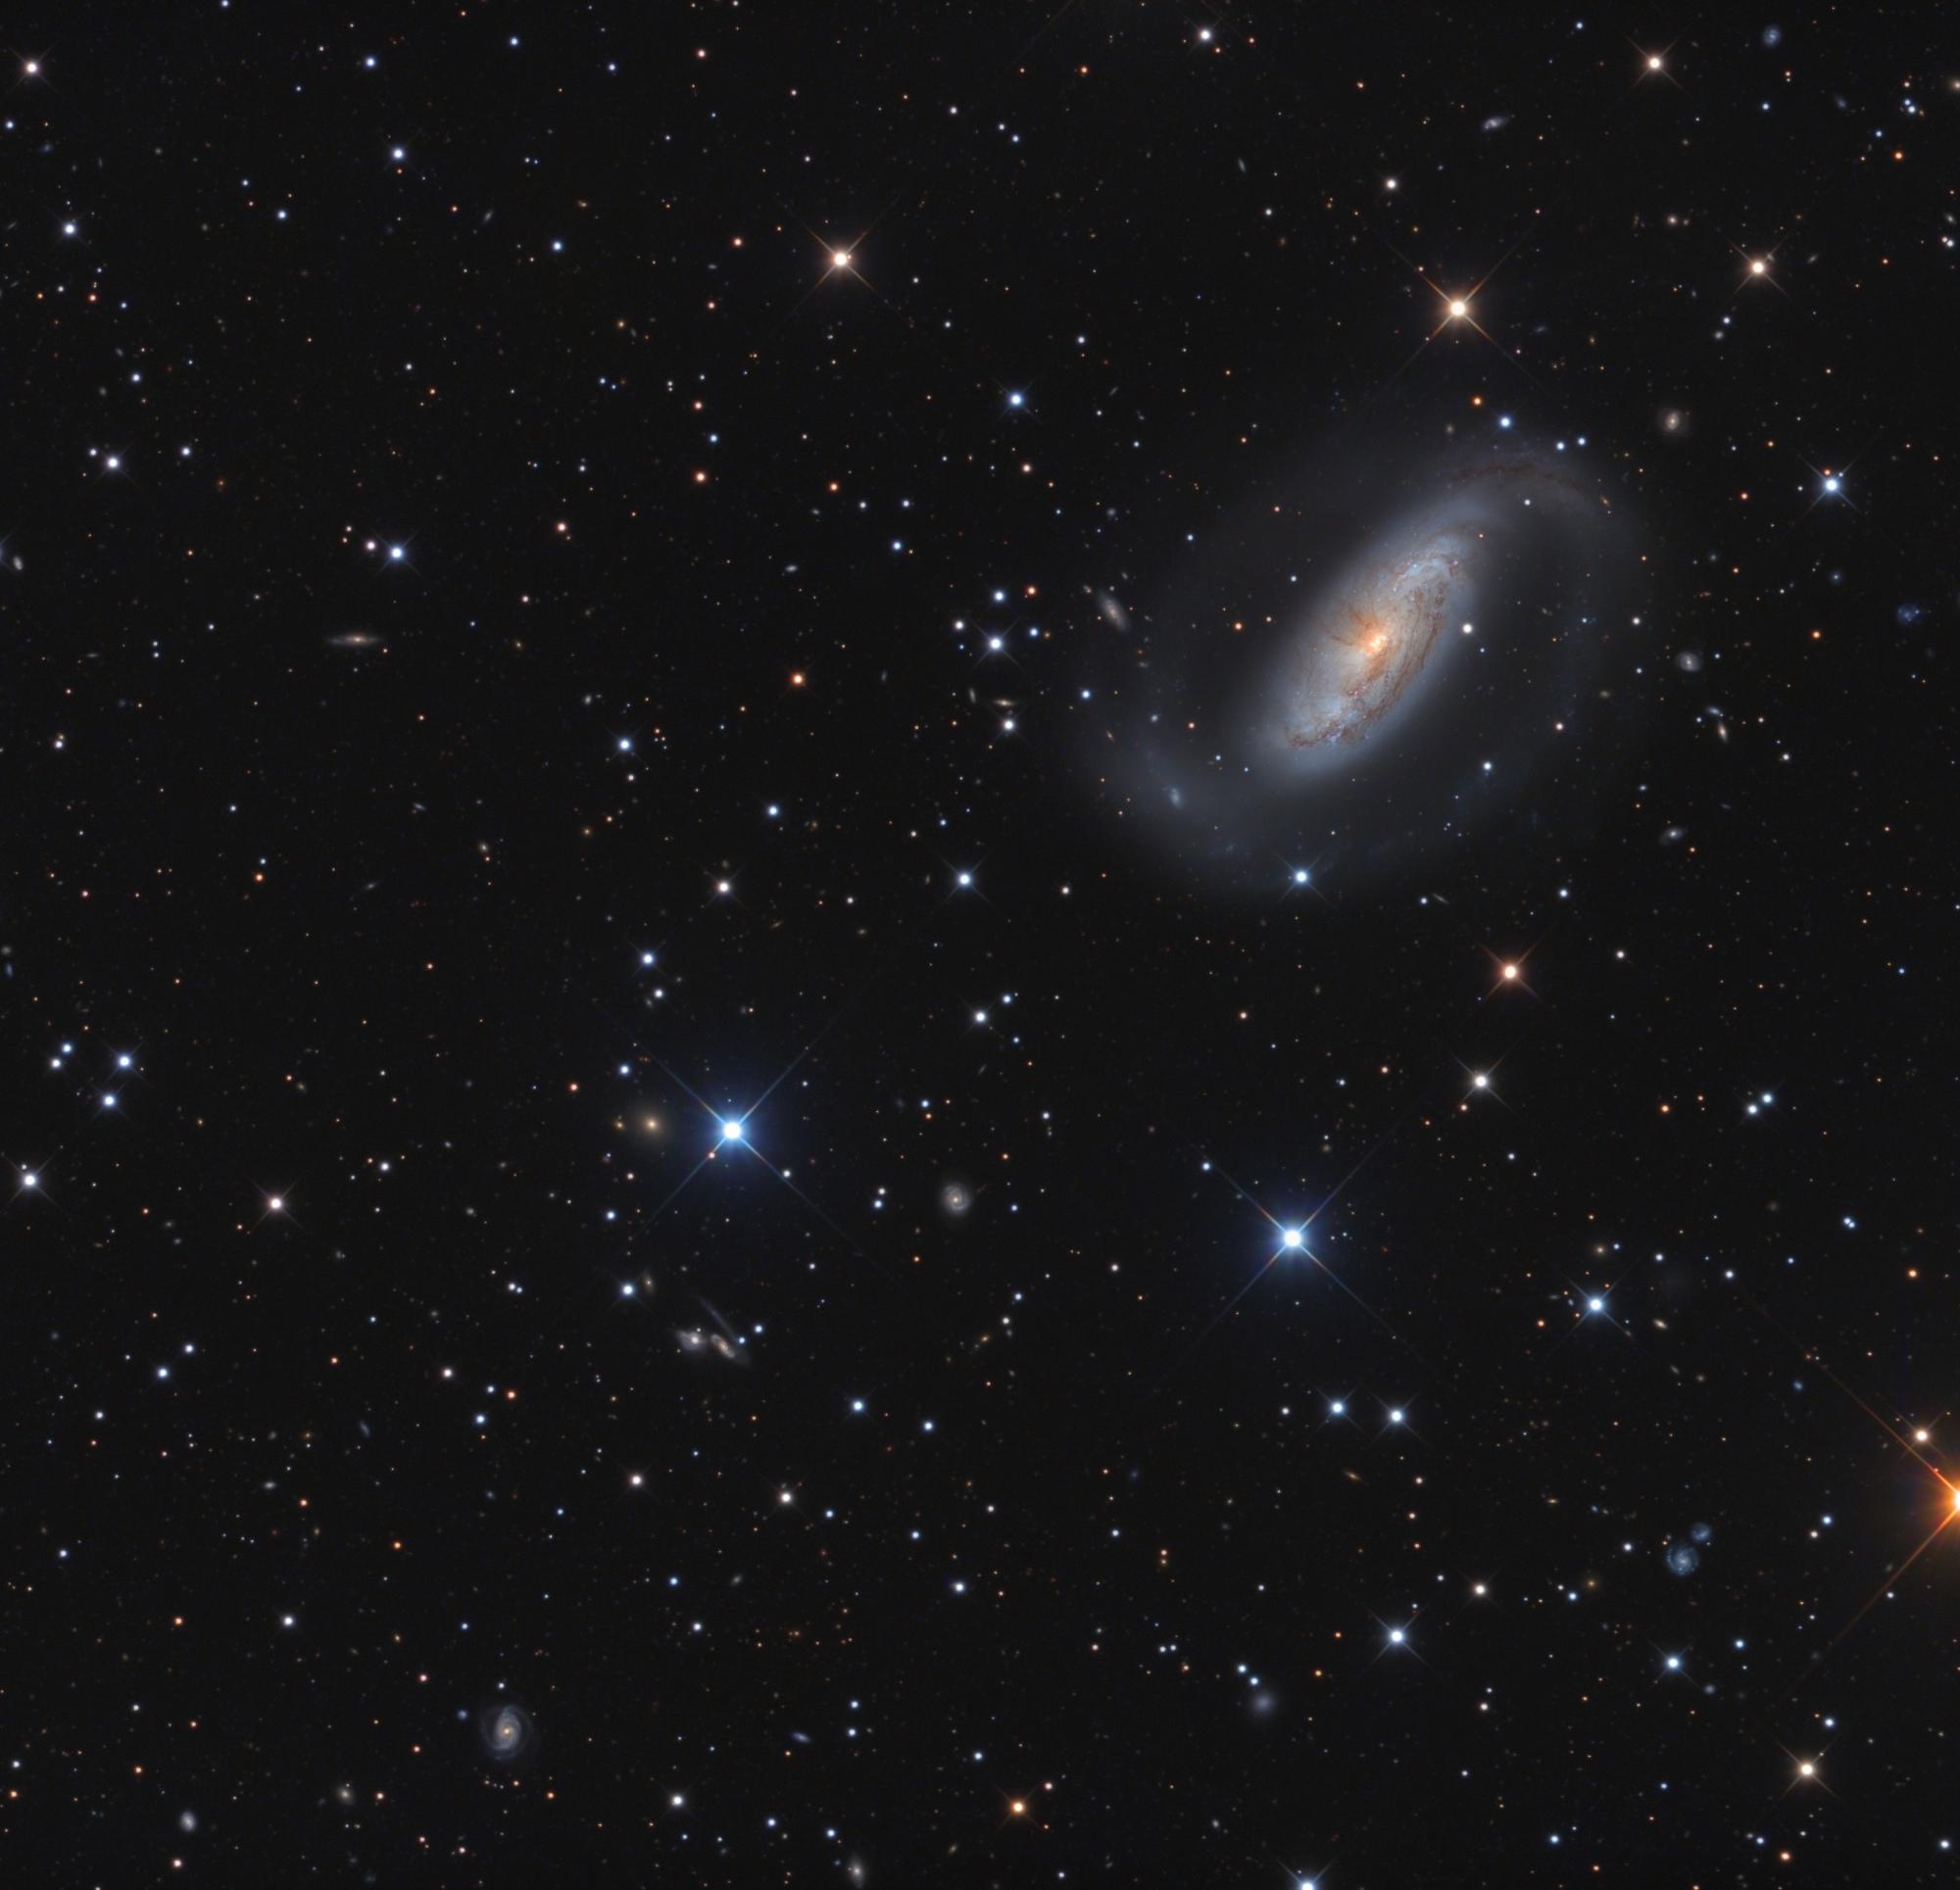 NGC1808-LRVB-V11-Crop-Publi.thumb.jpg.12413c1f5ee4d44a9f4f9ee3a76e5bef.jpg